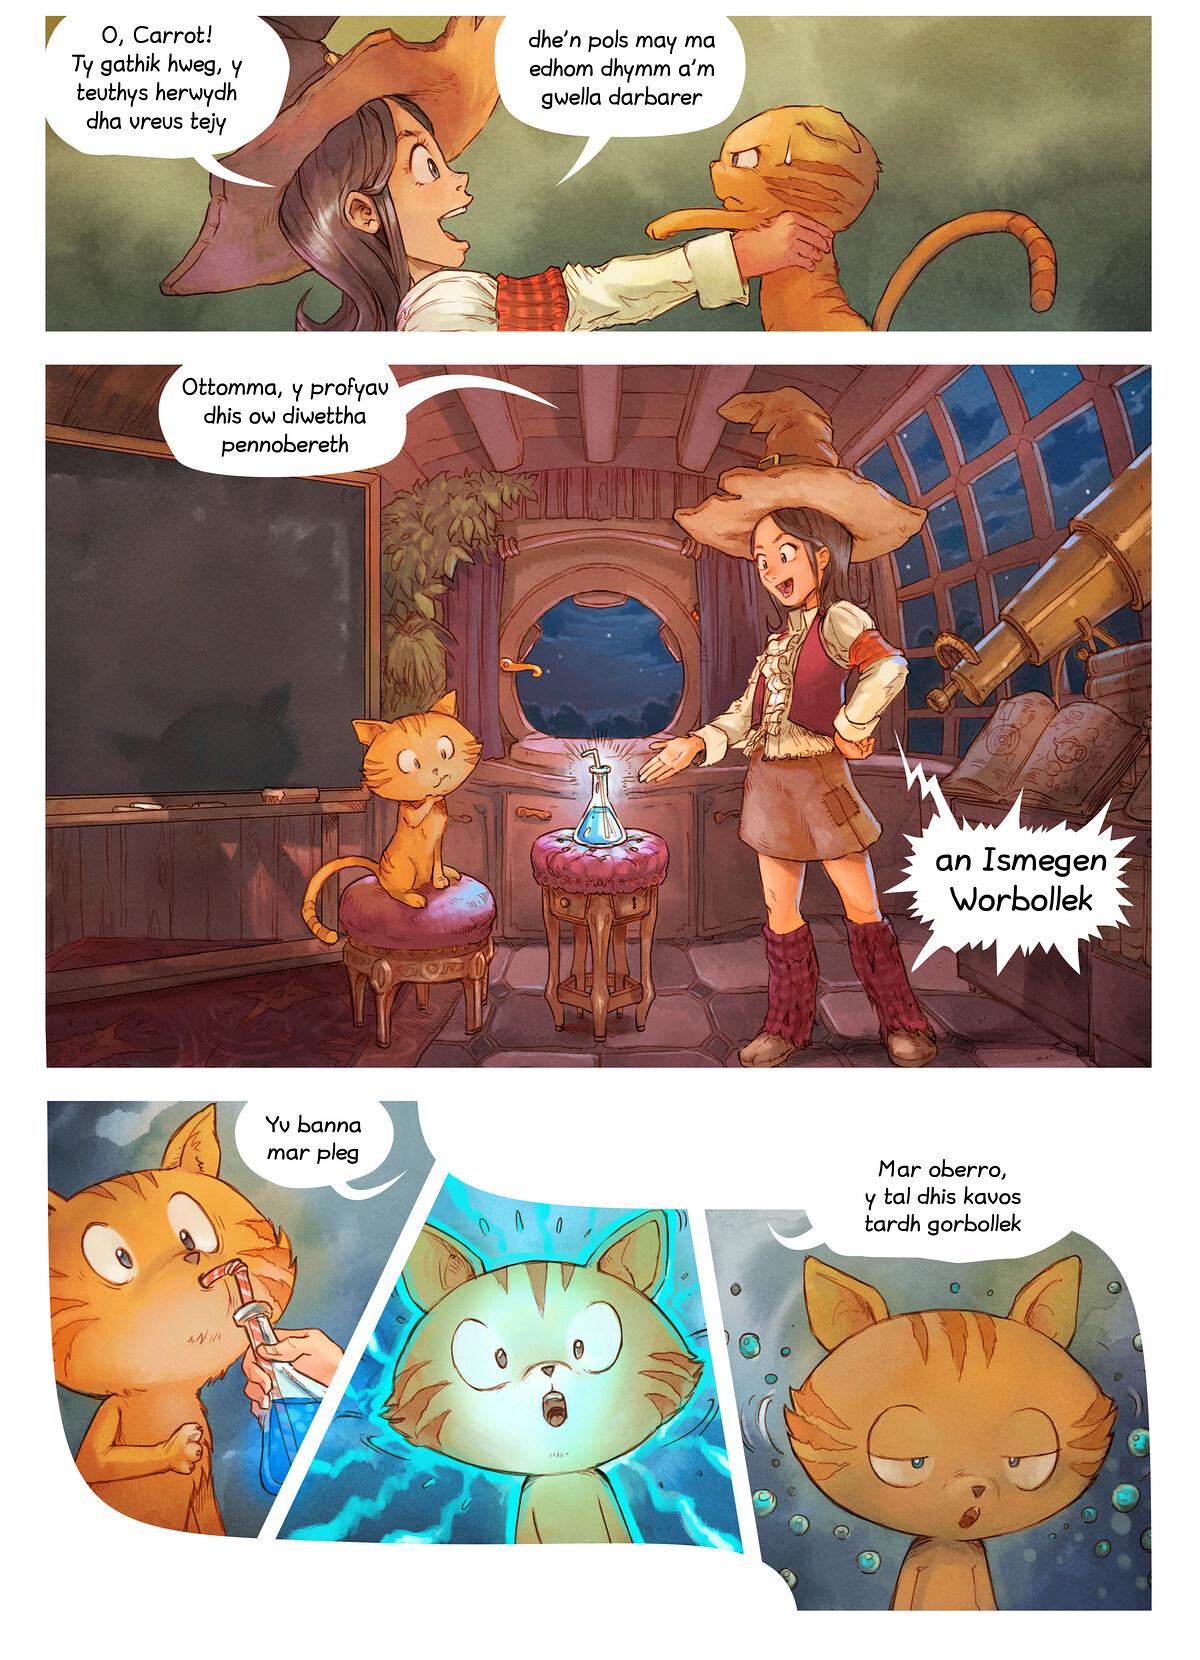 Rann 4: Tardh Gorbollek, Page 3